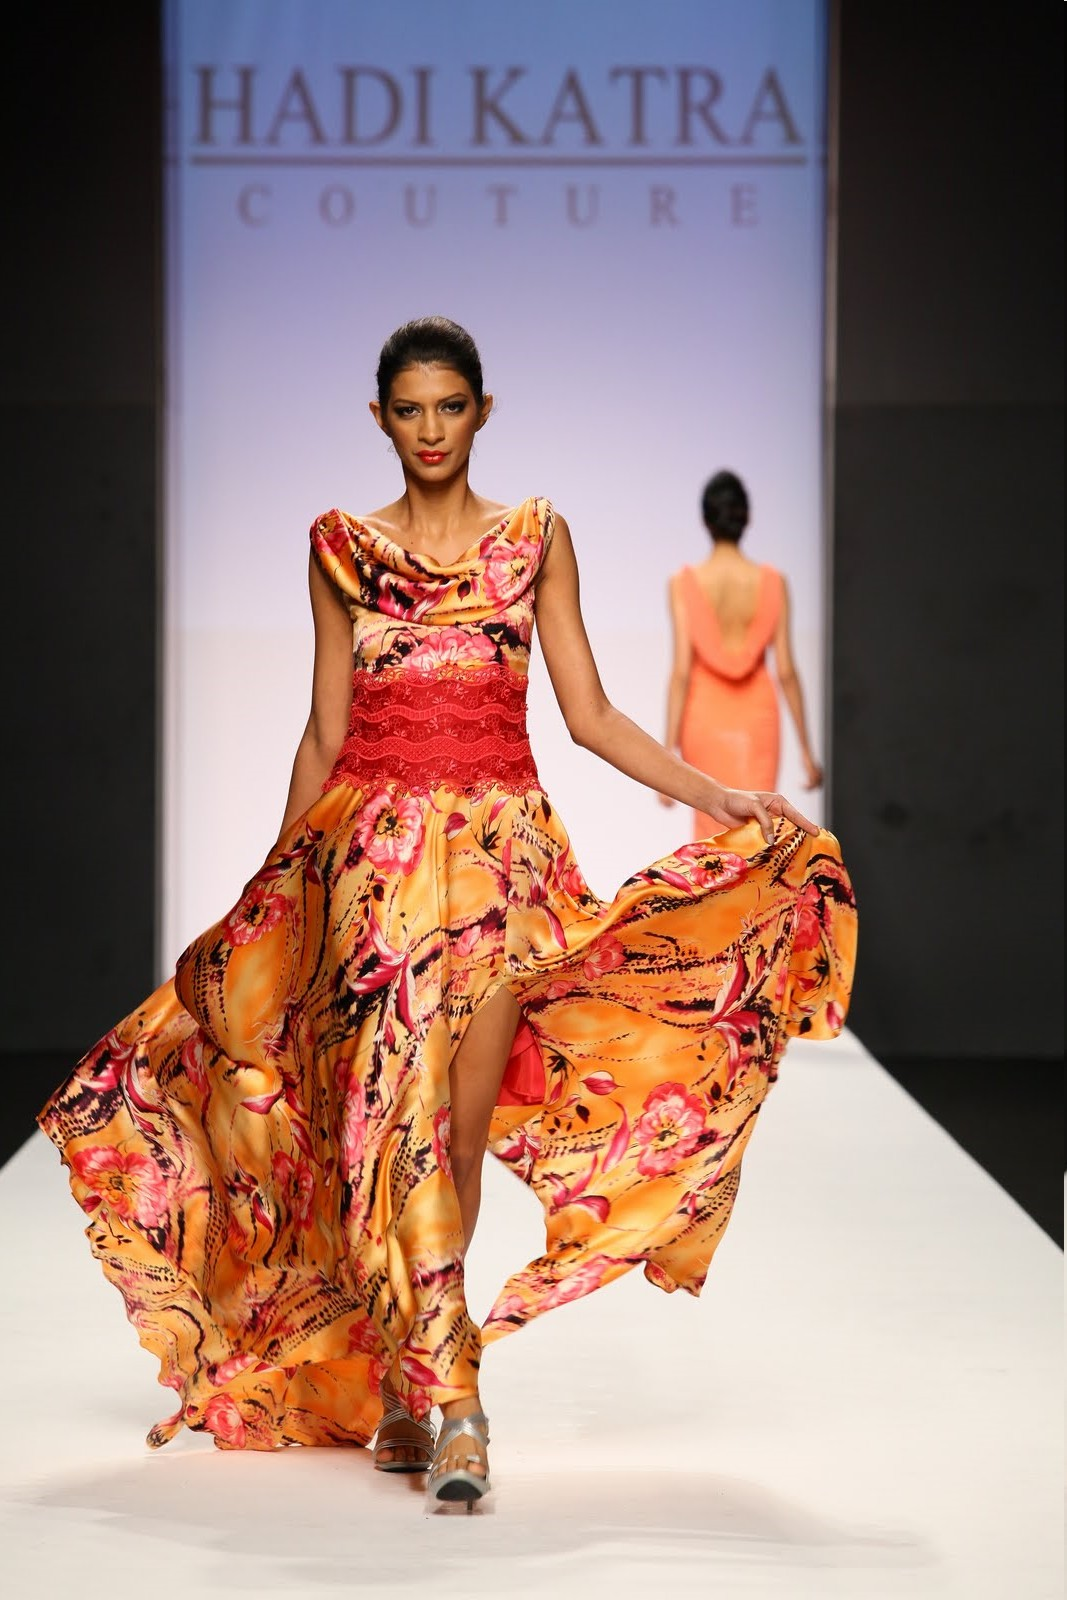 Dubai Fashion Week 2012 Fashion Trends Latest Fashion News Trends And Designers